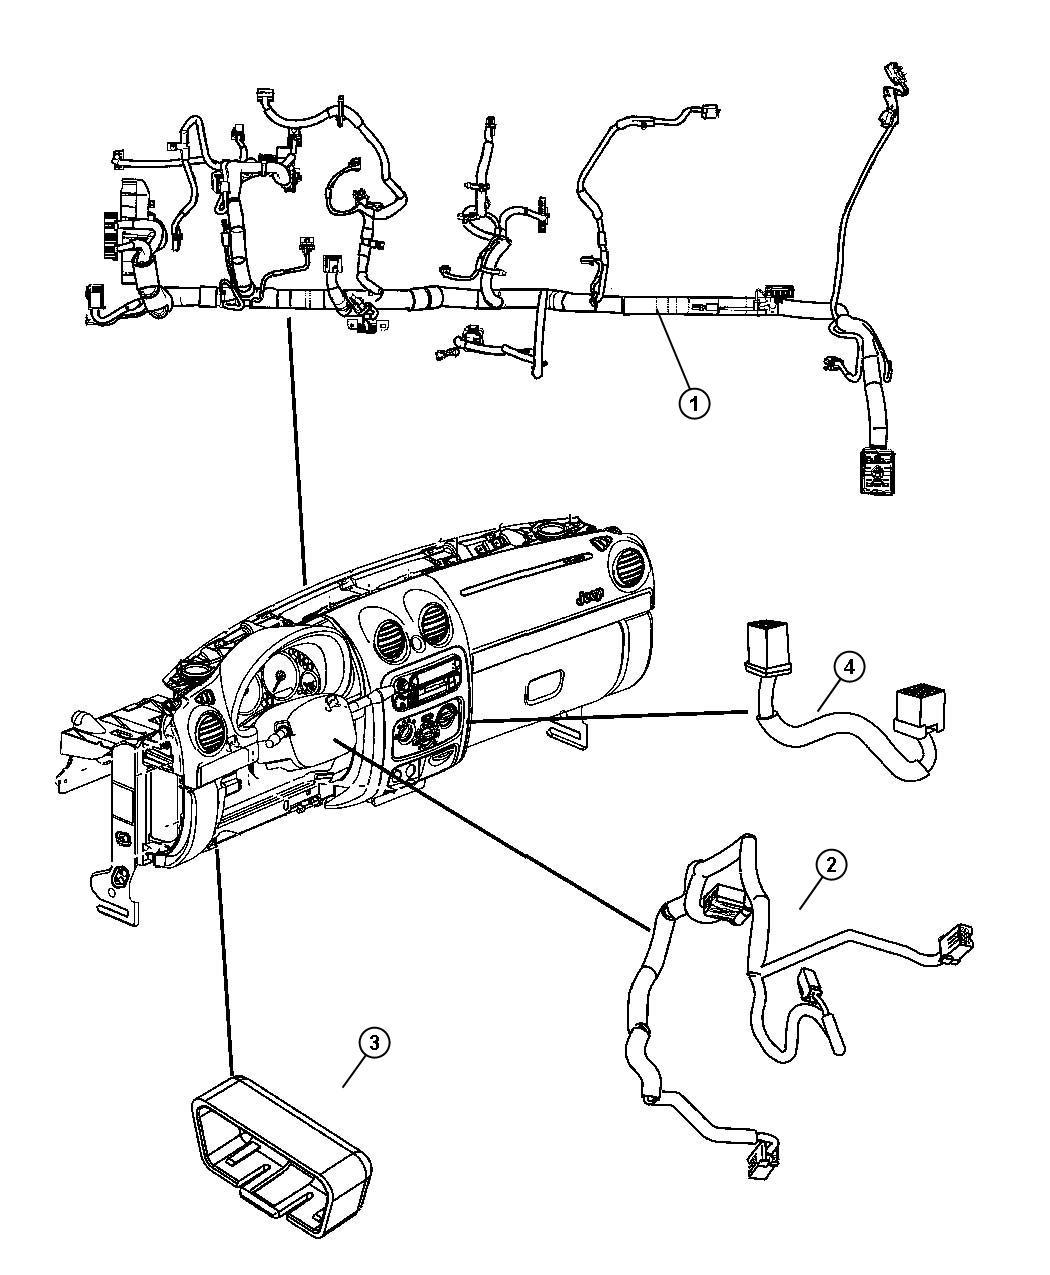 Jeep Liberty Wiring. Steering wheel. Trim: [all trim codes